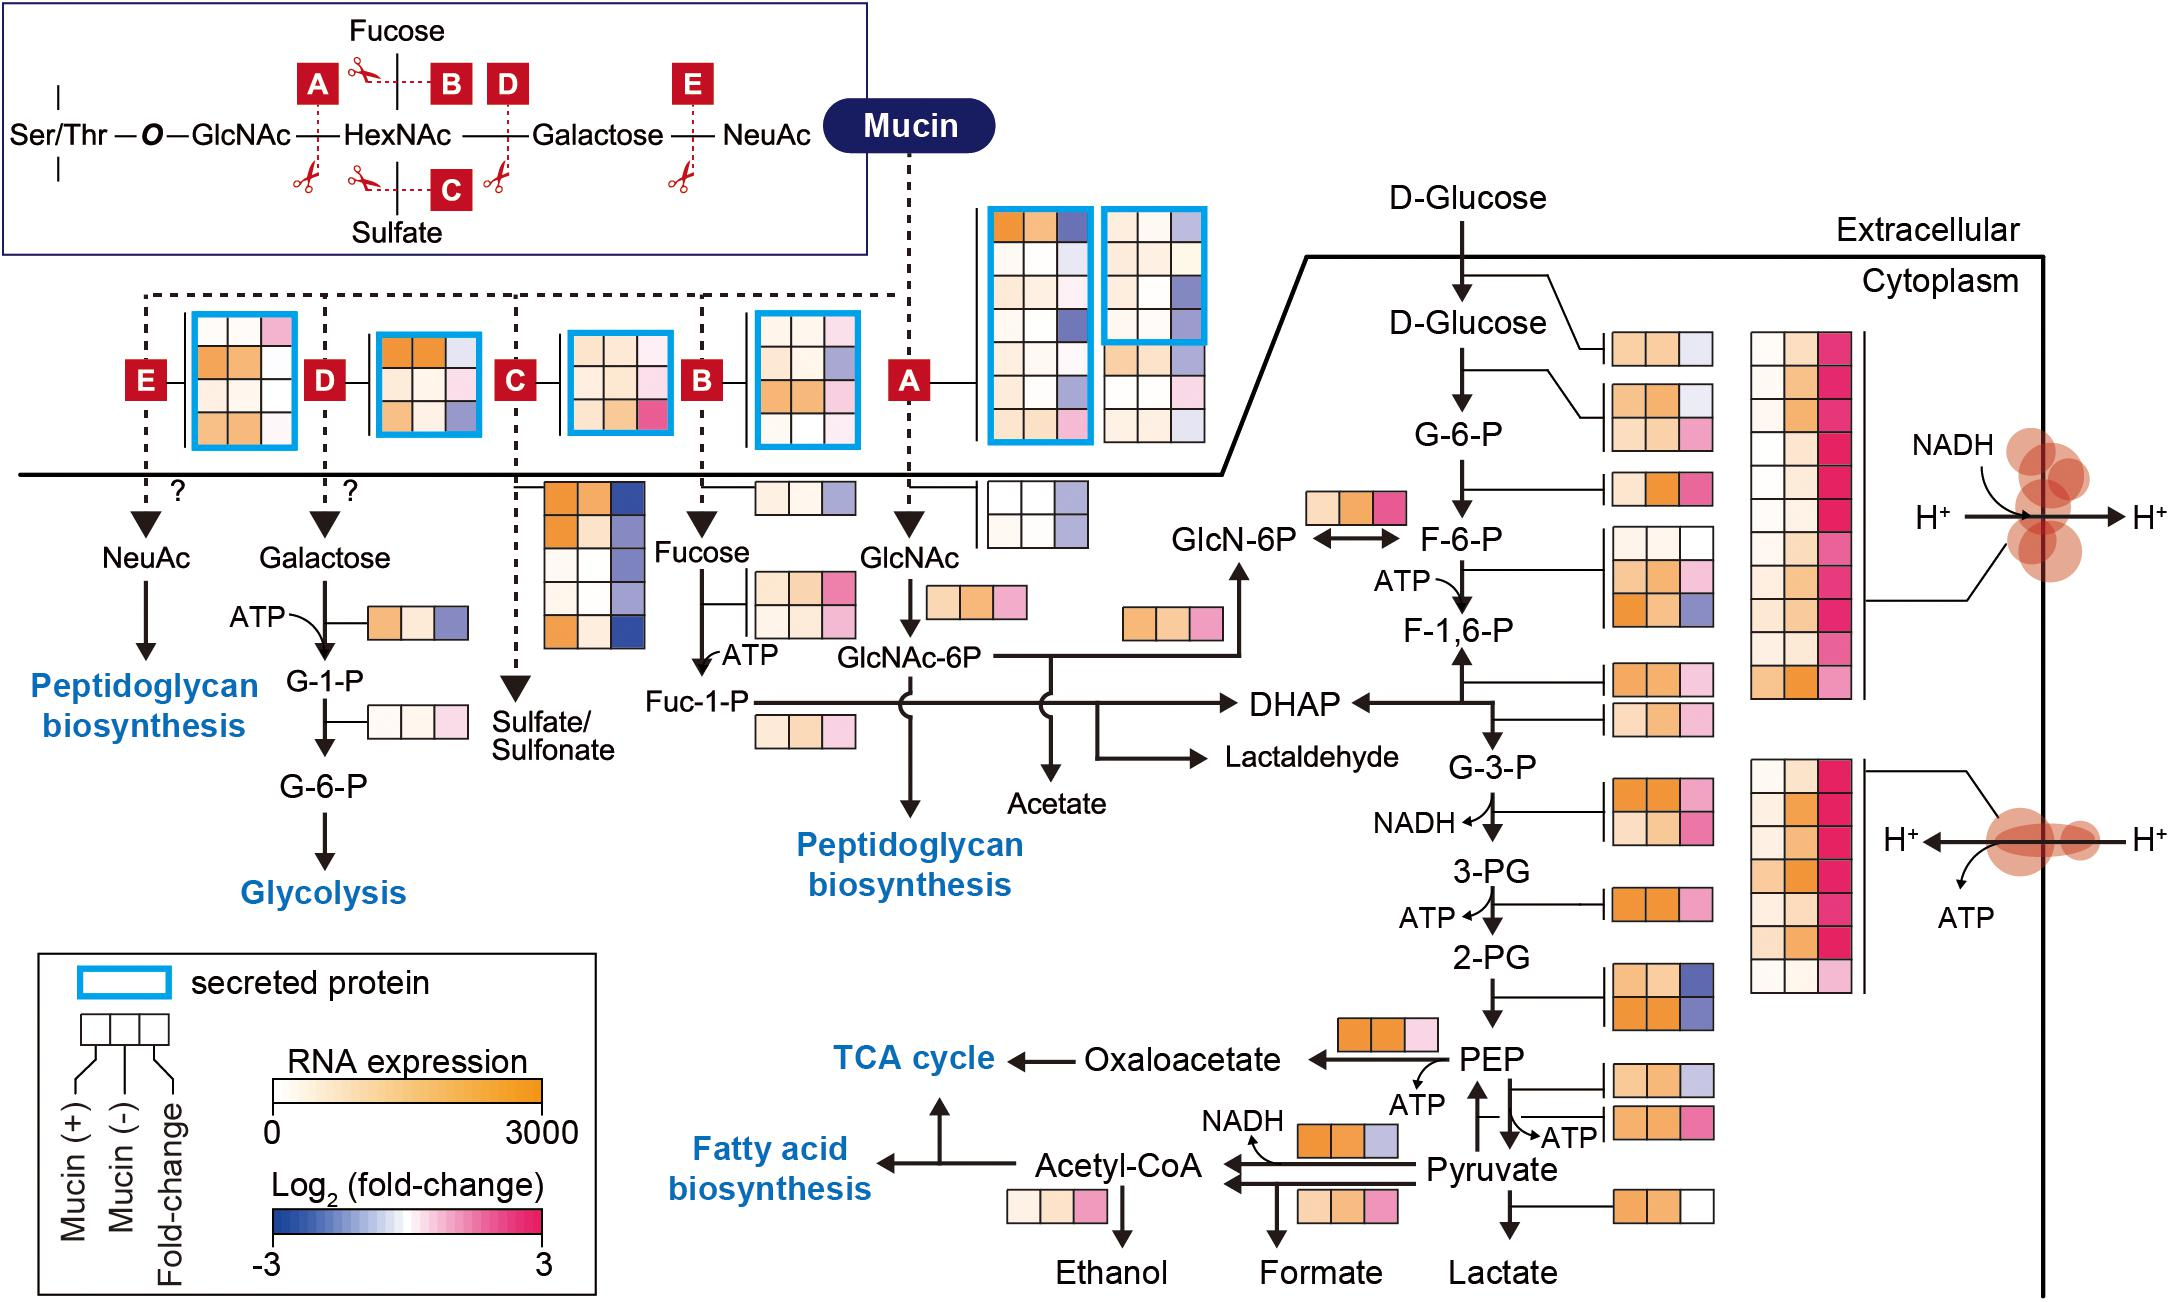 Frontiers | Elucidation of Akkermansia muciniphila Probiotic